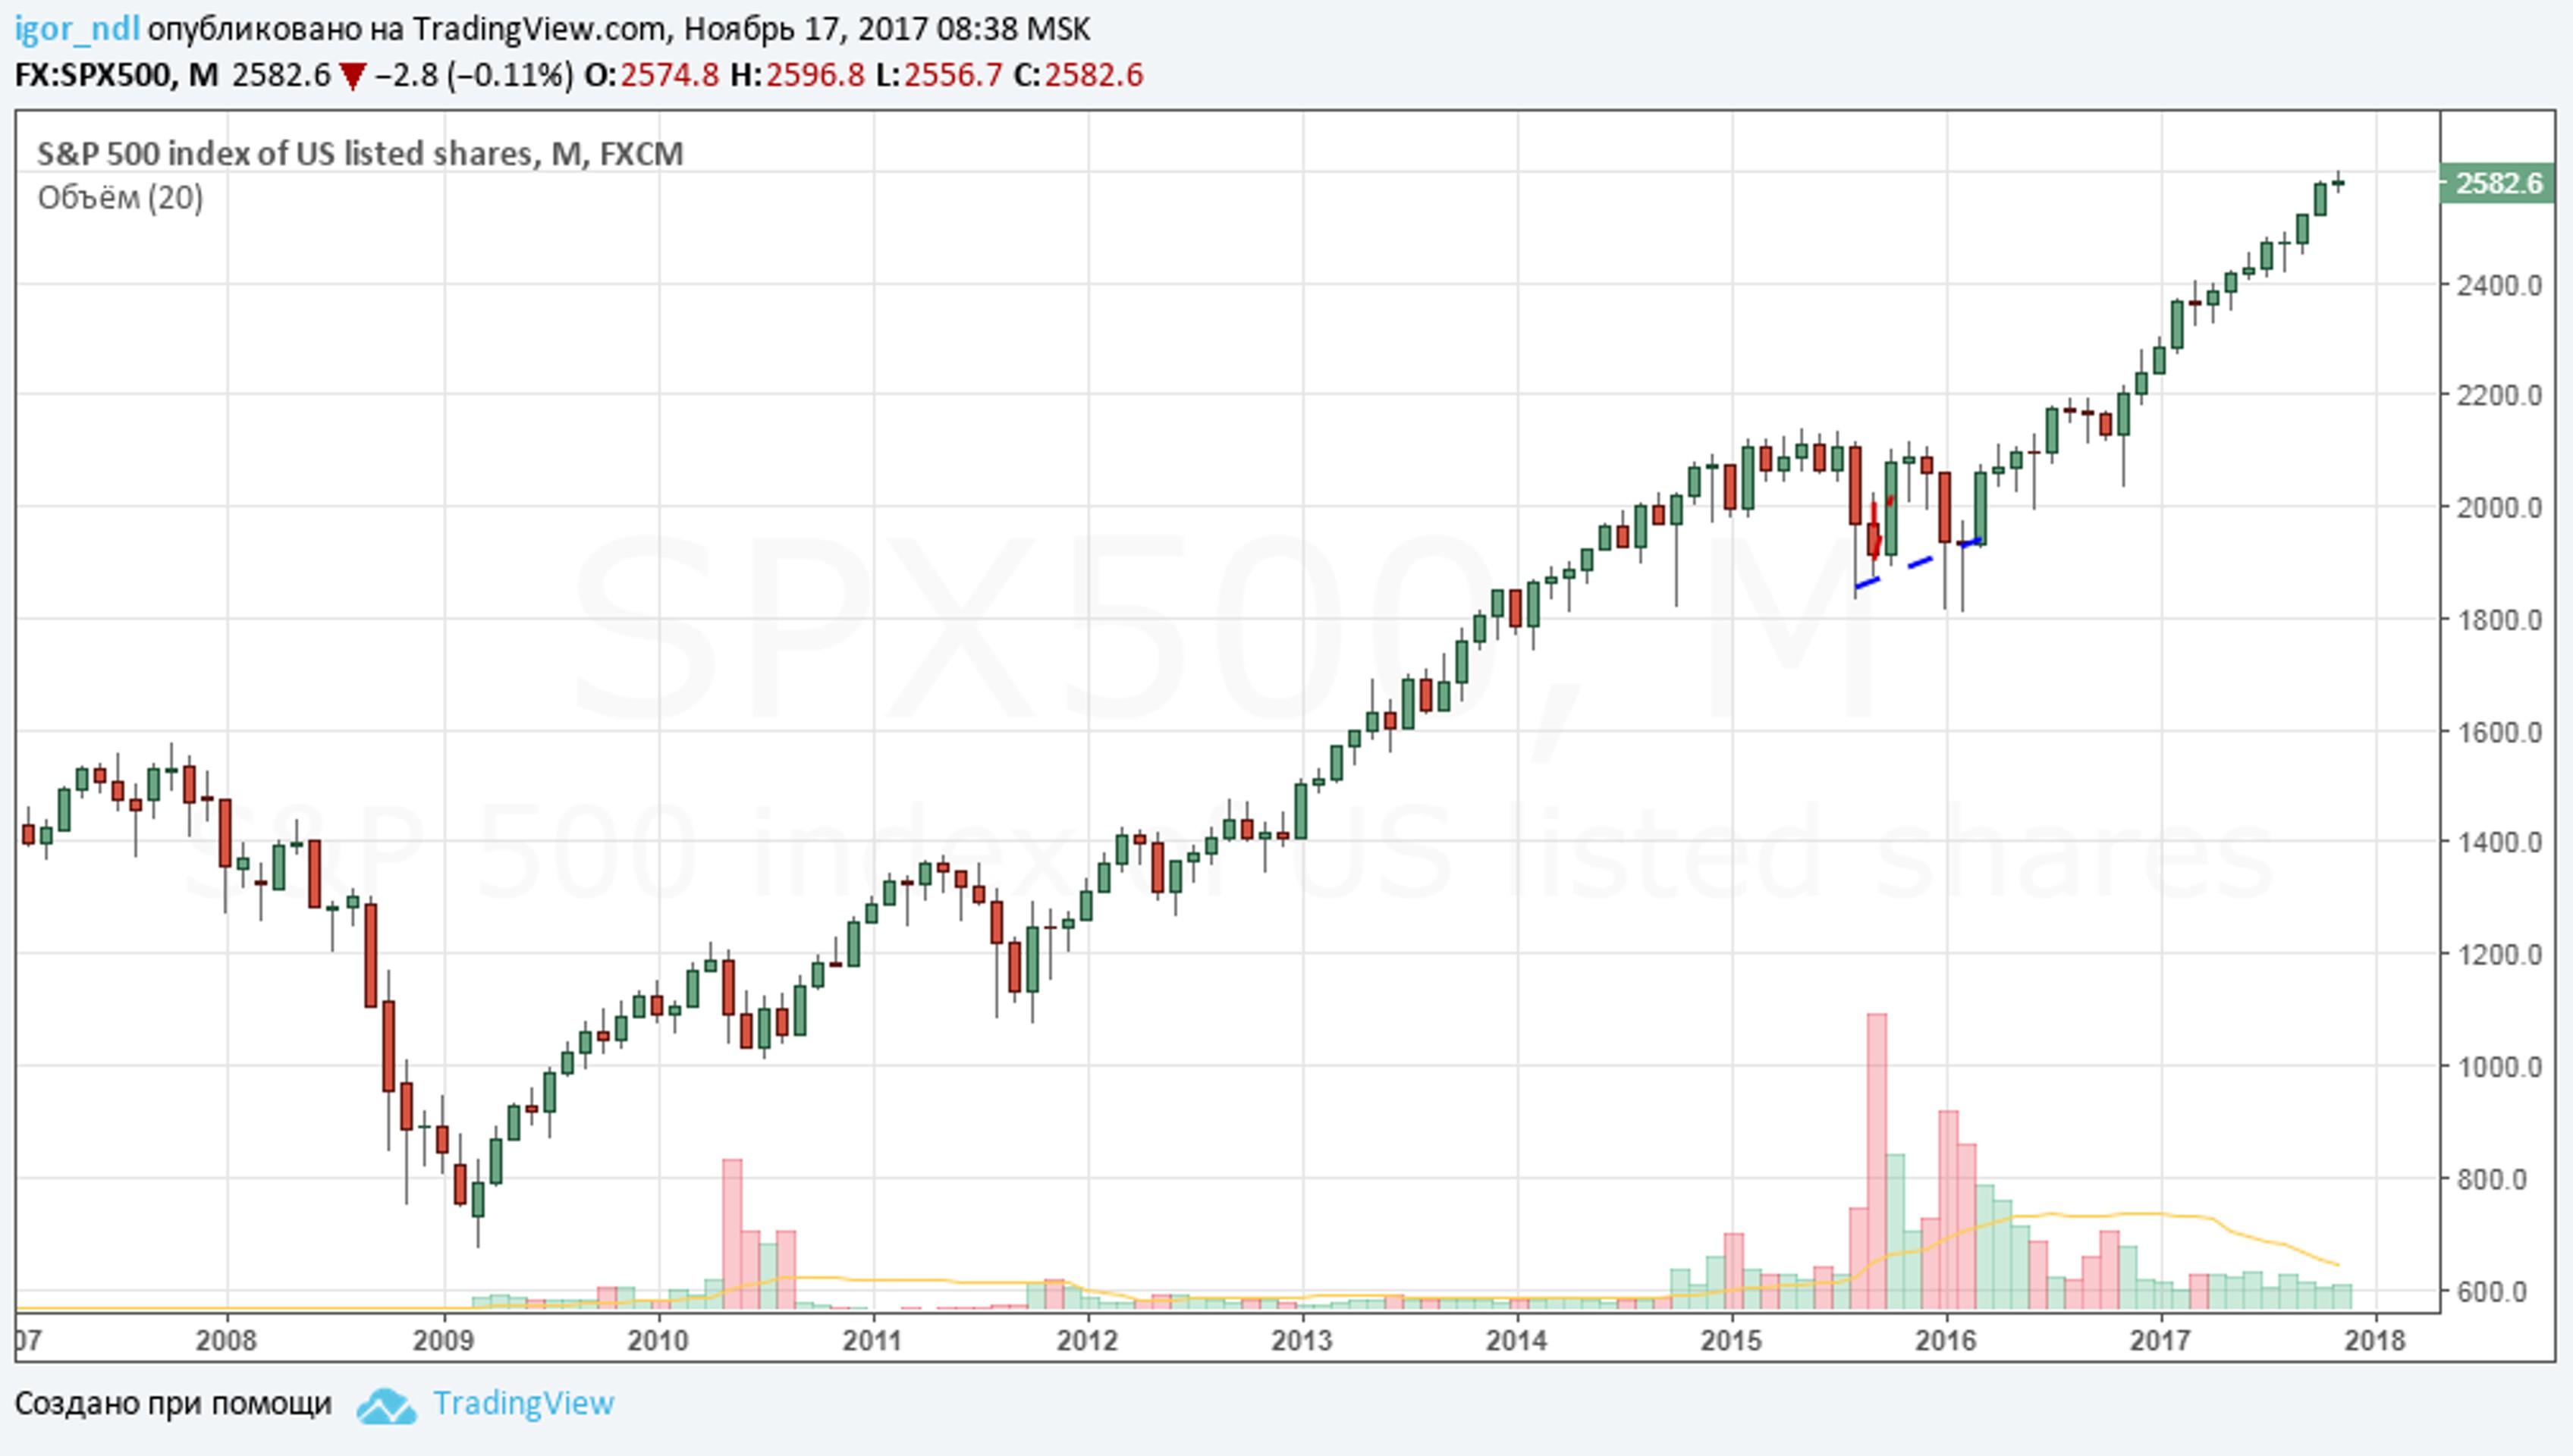 ФРС снова запустит QE и введет NIRP?